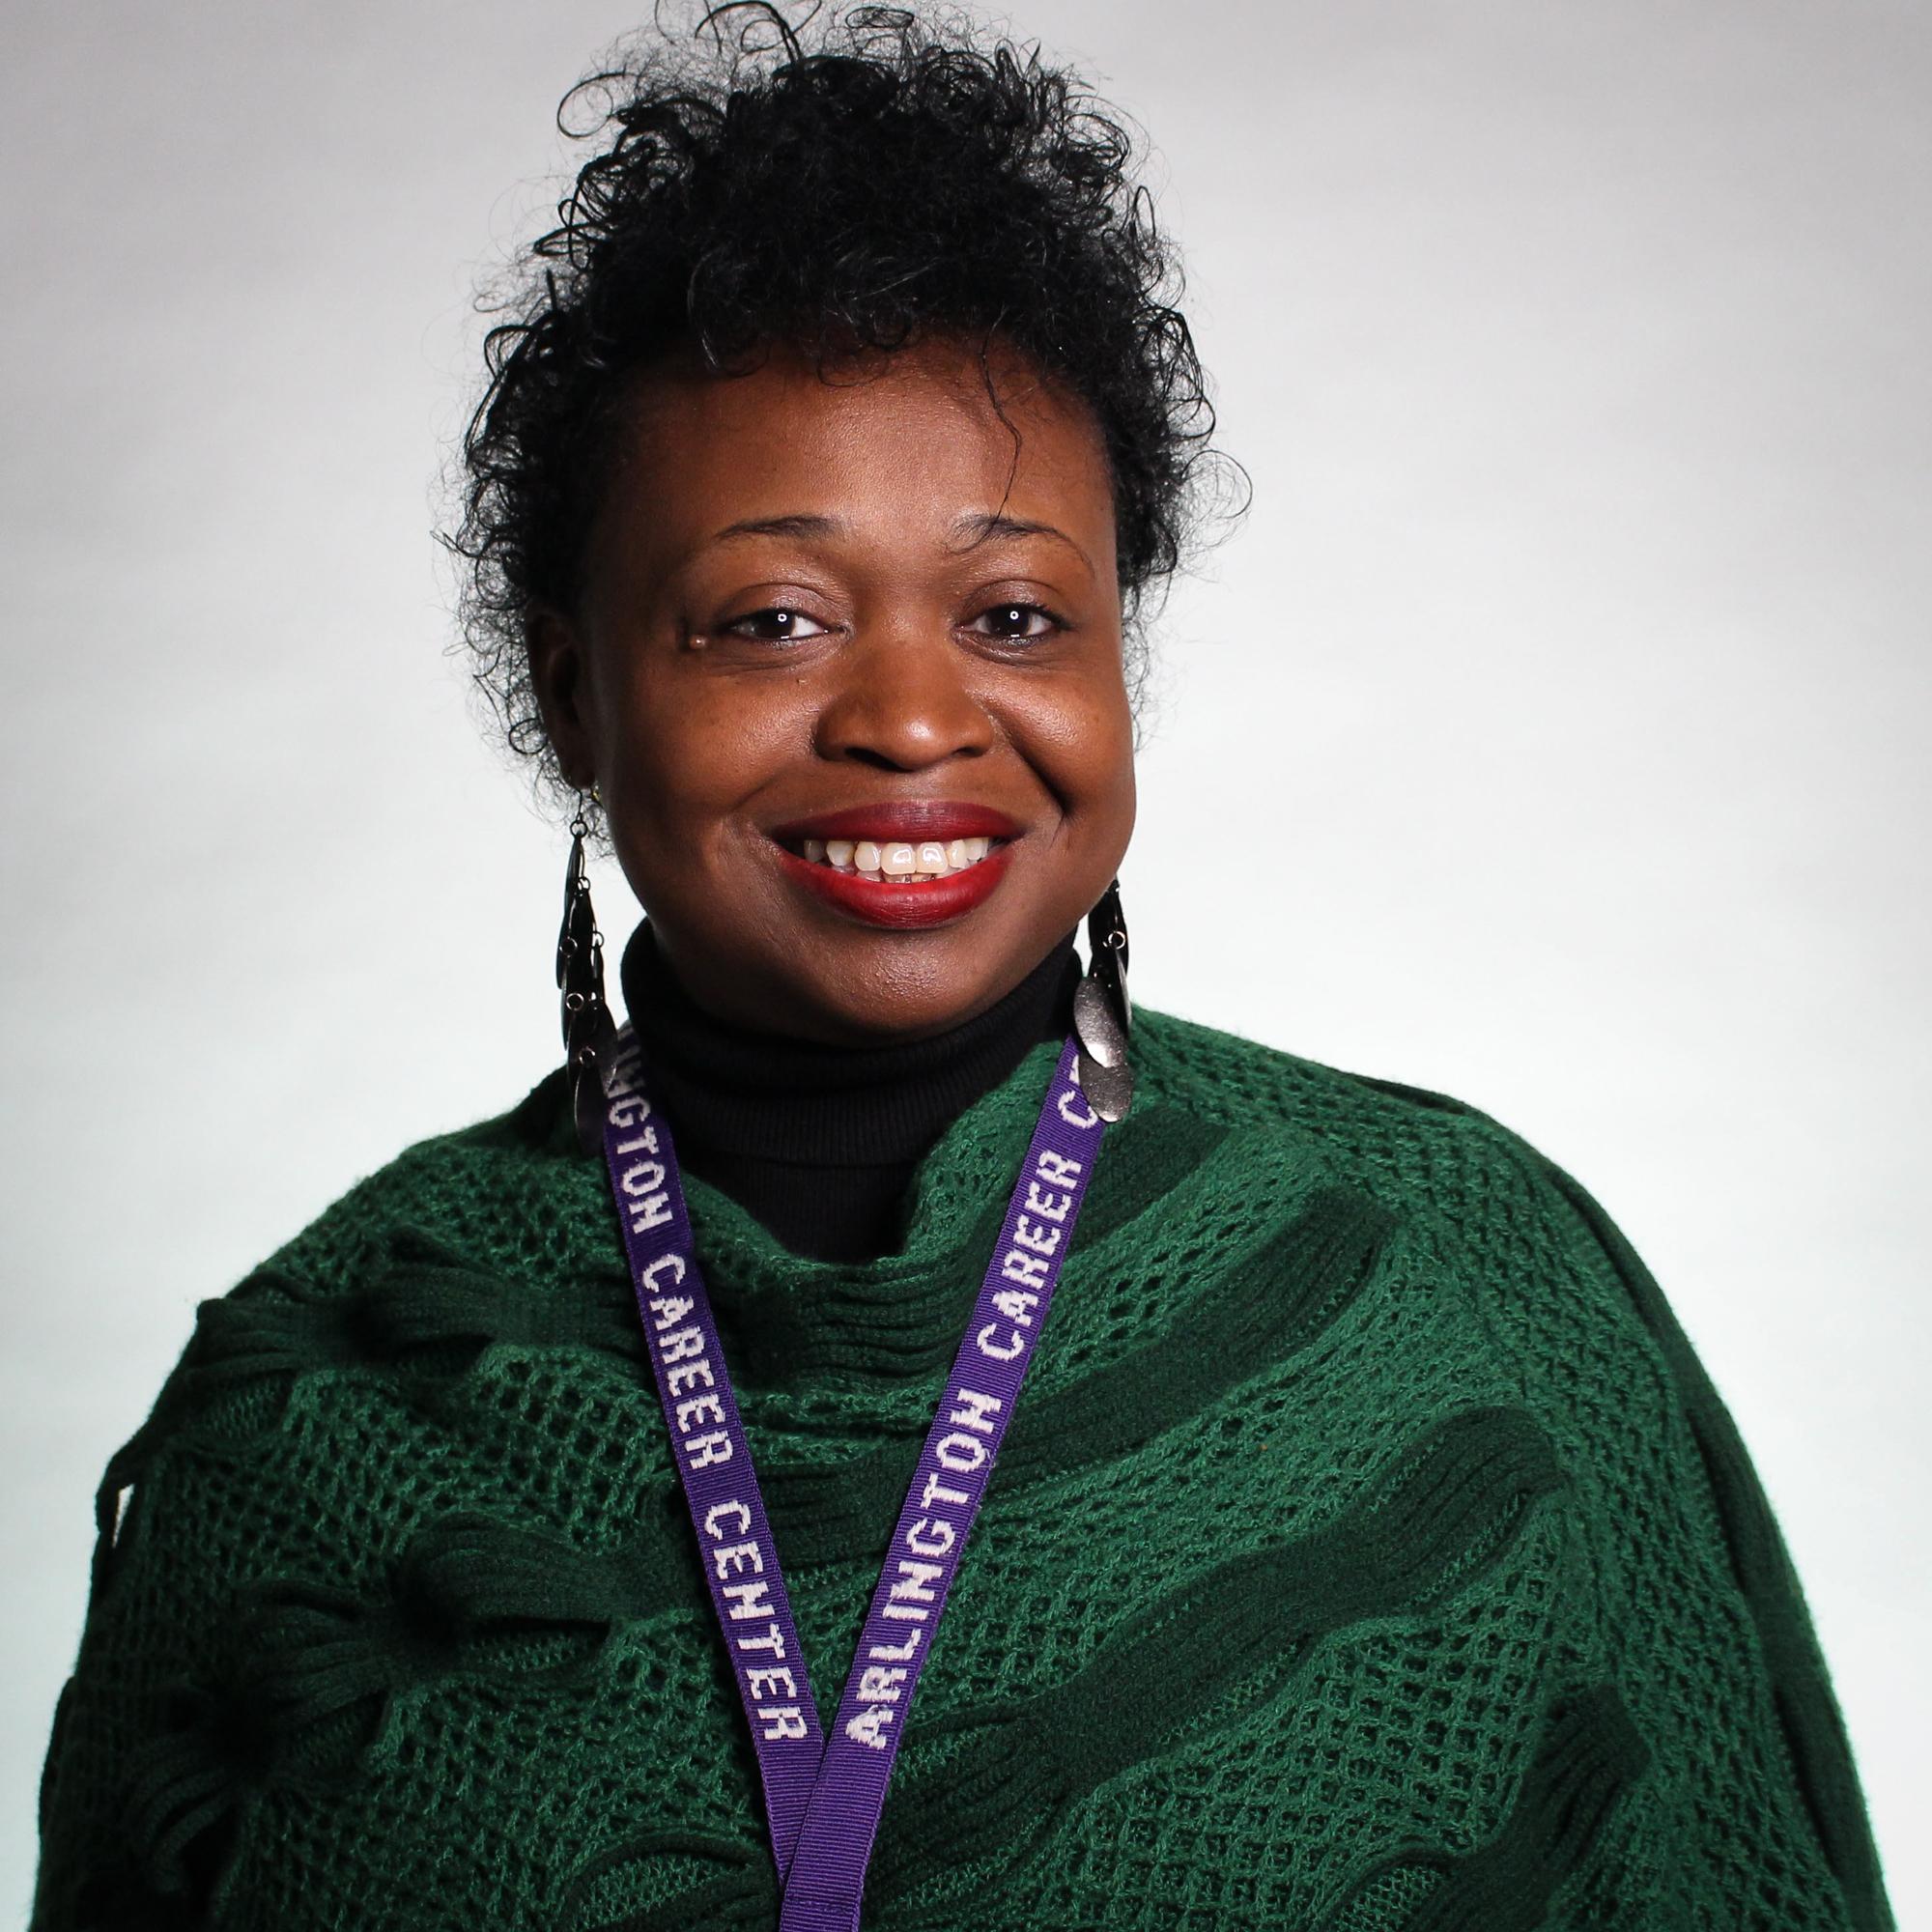 Ms. KaShauna Spratley